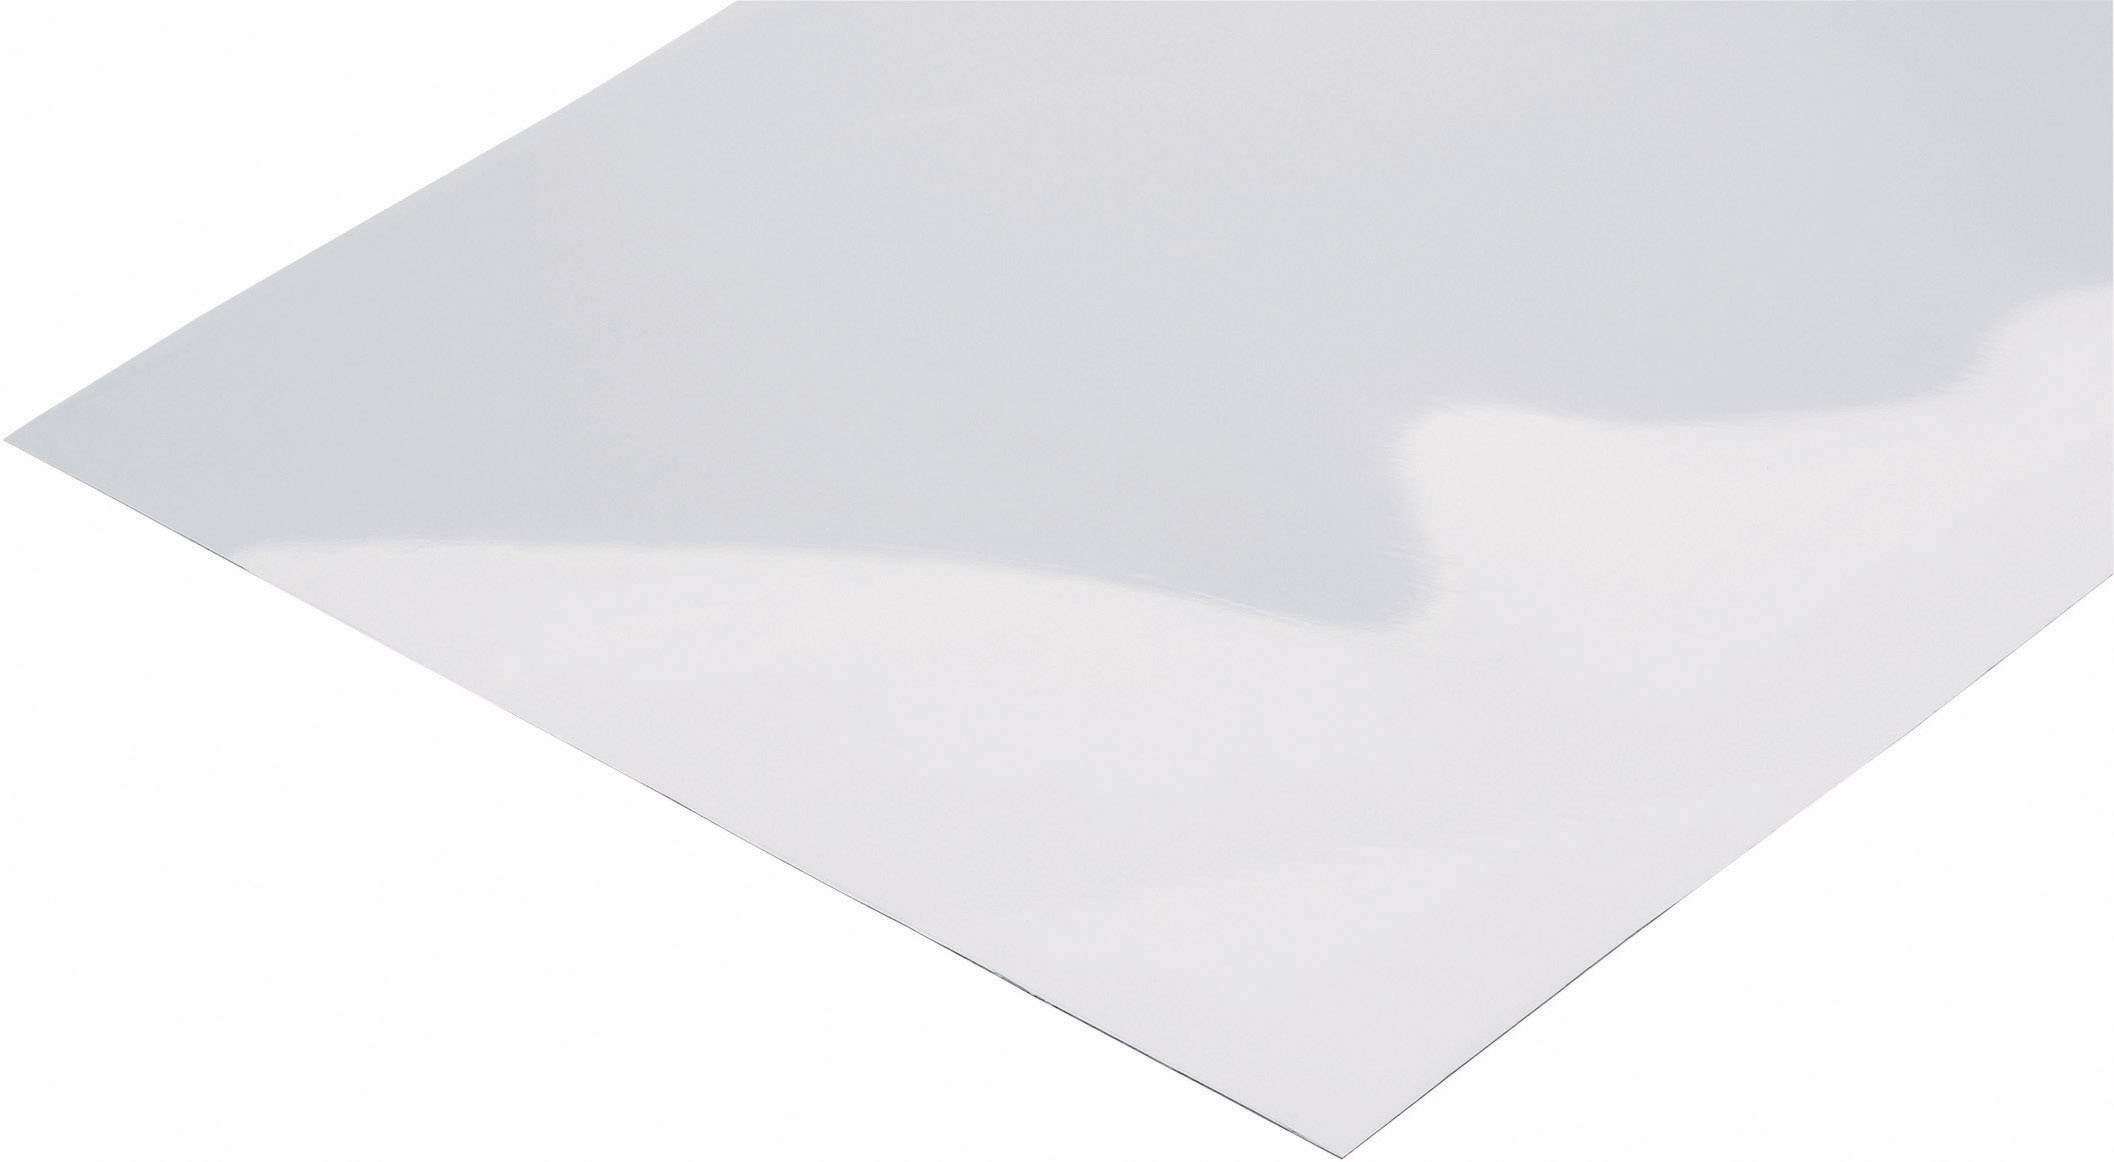 Polykarbonátová deska Modelcraft 400 x 500 x 1,5 mm